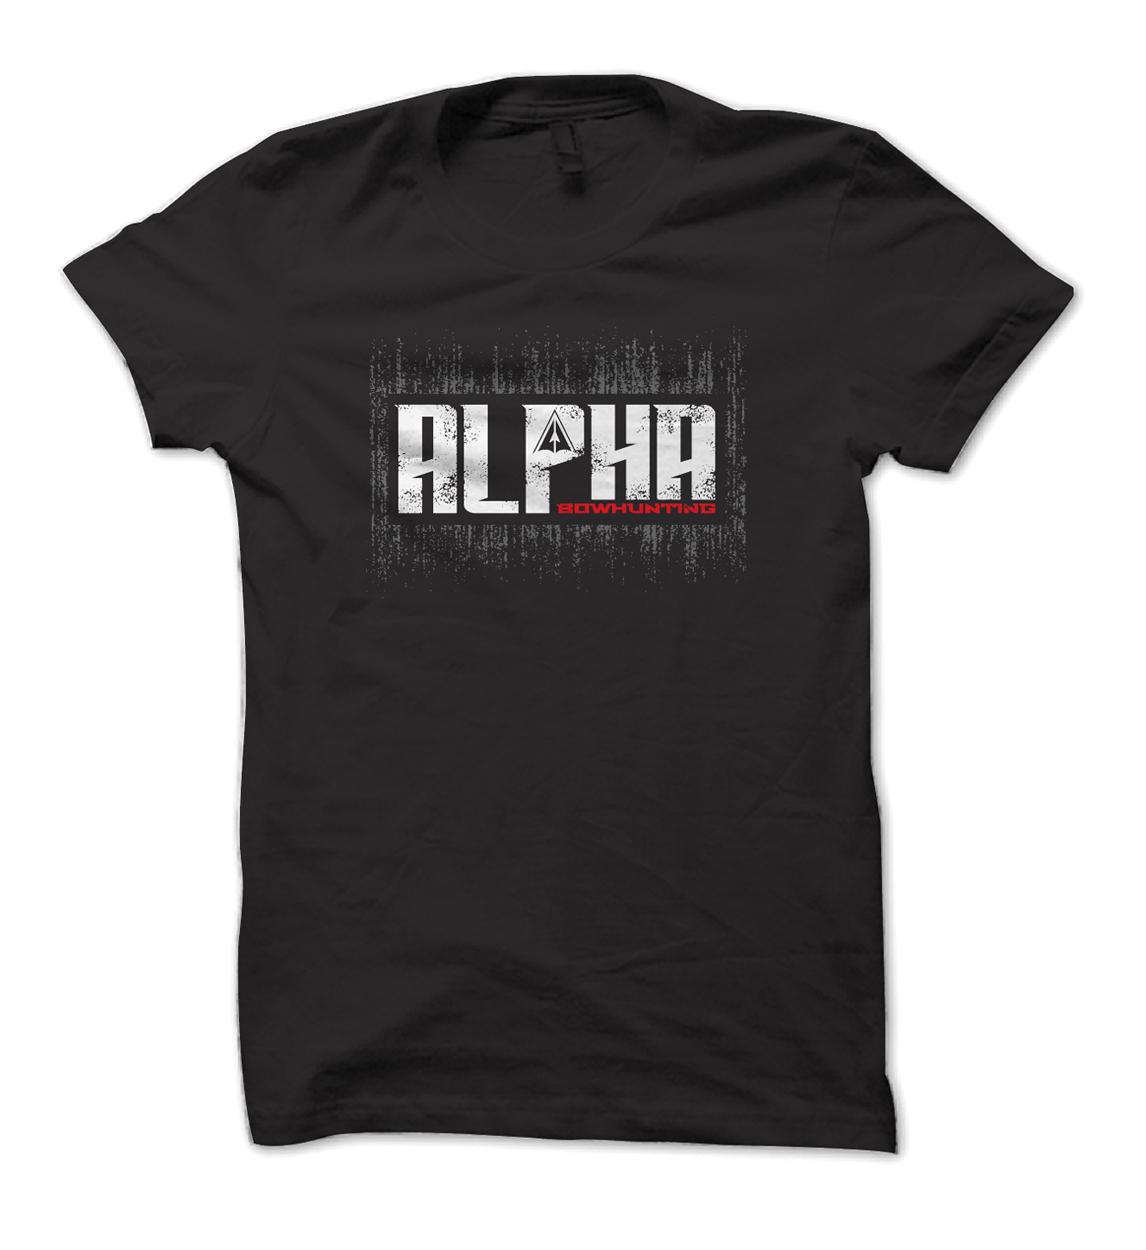 Alpha Bowhunting LIfestyle Block Tee Design